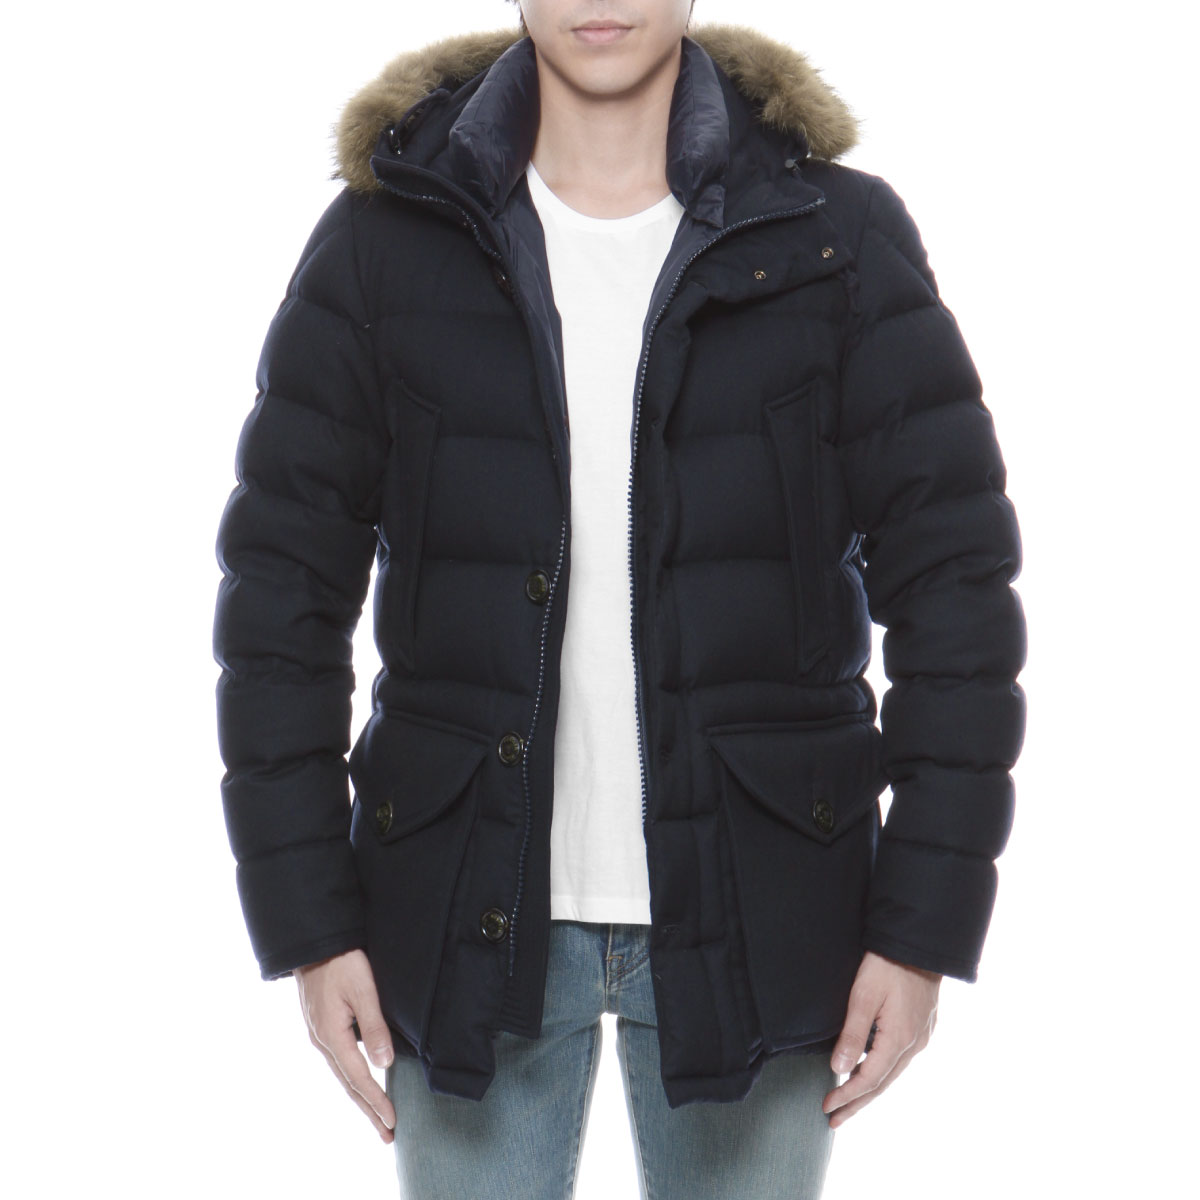 ea30d1fd4 Down jacket RETHE レセ NAVY dark blue with Monk rail MONCLER outer men RETHE  54272 780 fur & food